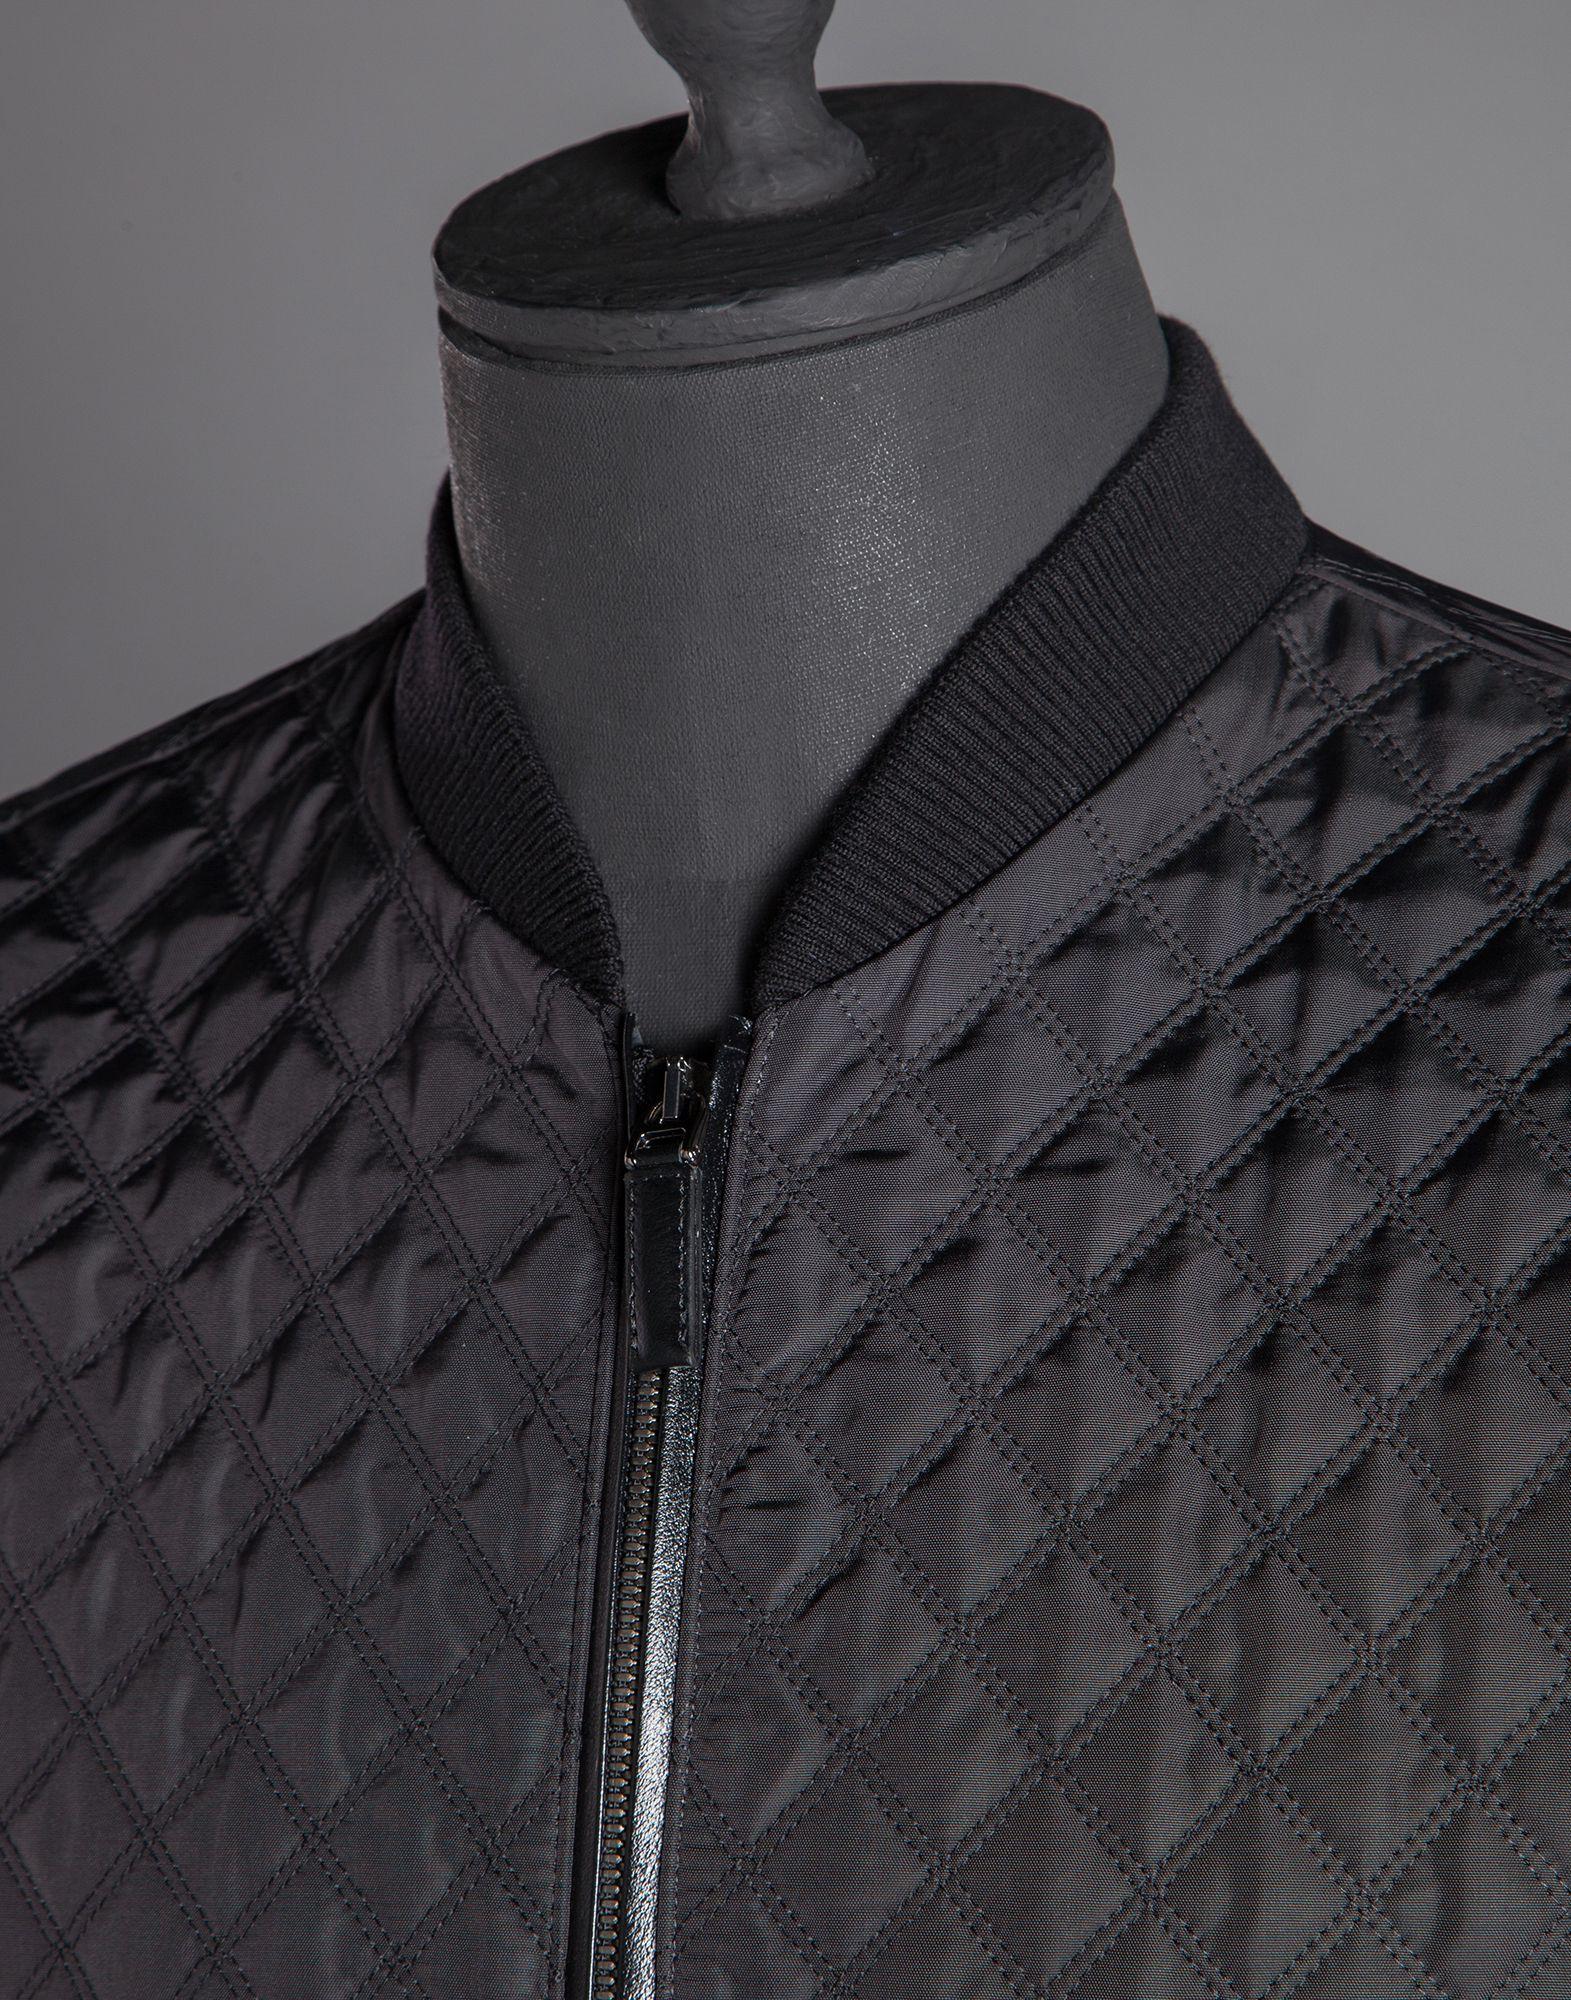 Lyst Dolce Gabbana Quilted Nylon Bomber Jacket In Black For Men